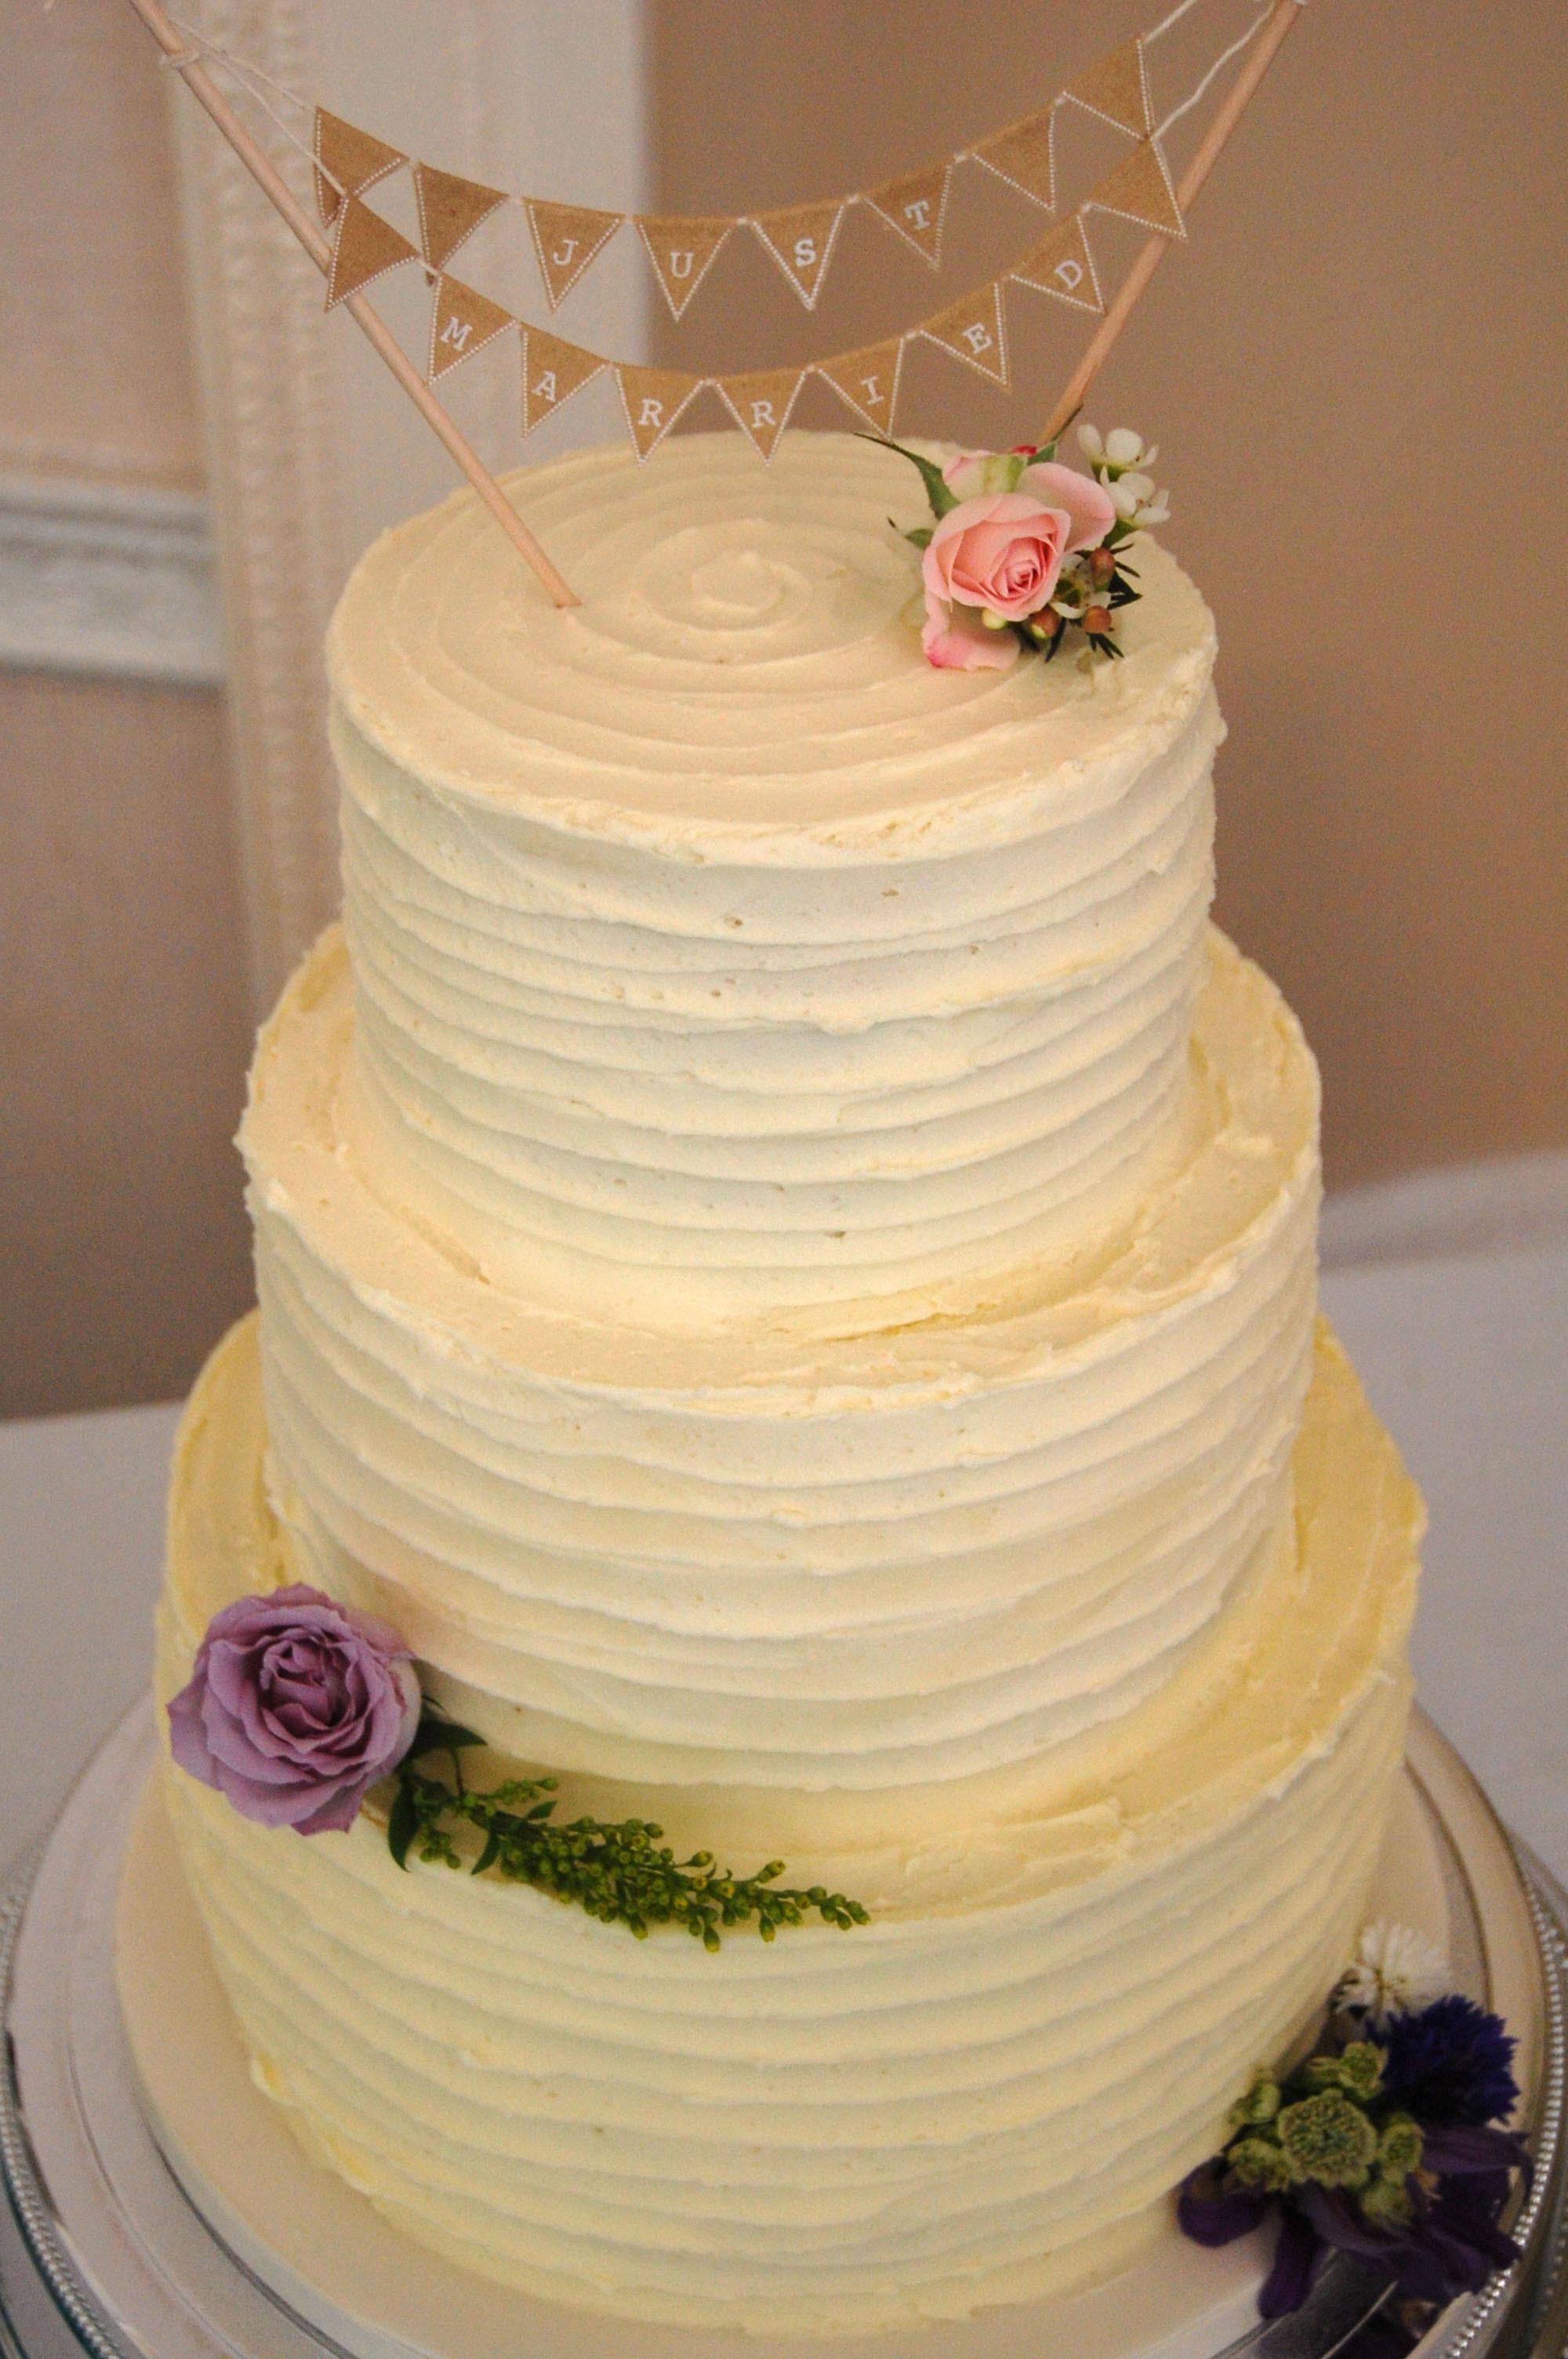 Wedding Cakes With Buttercream Icing  Wedding Cupcake Buttercream Recipe — Dishmaps